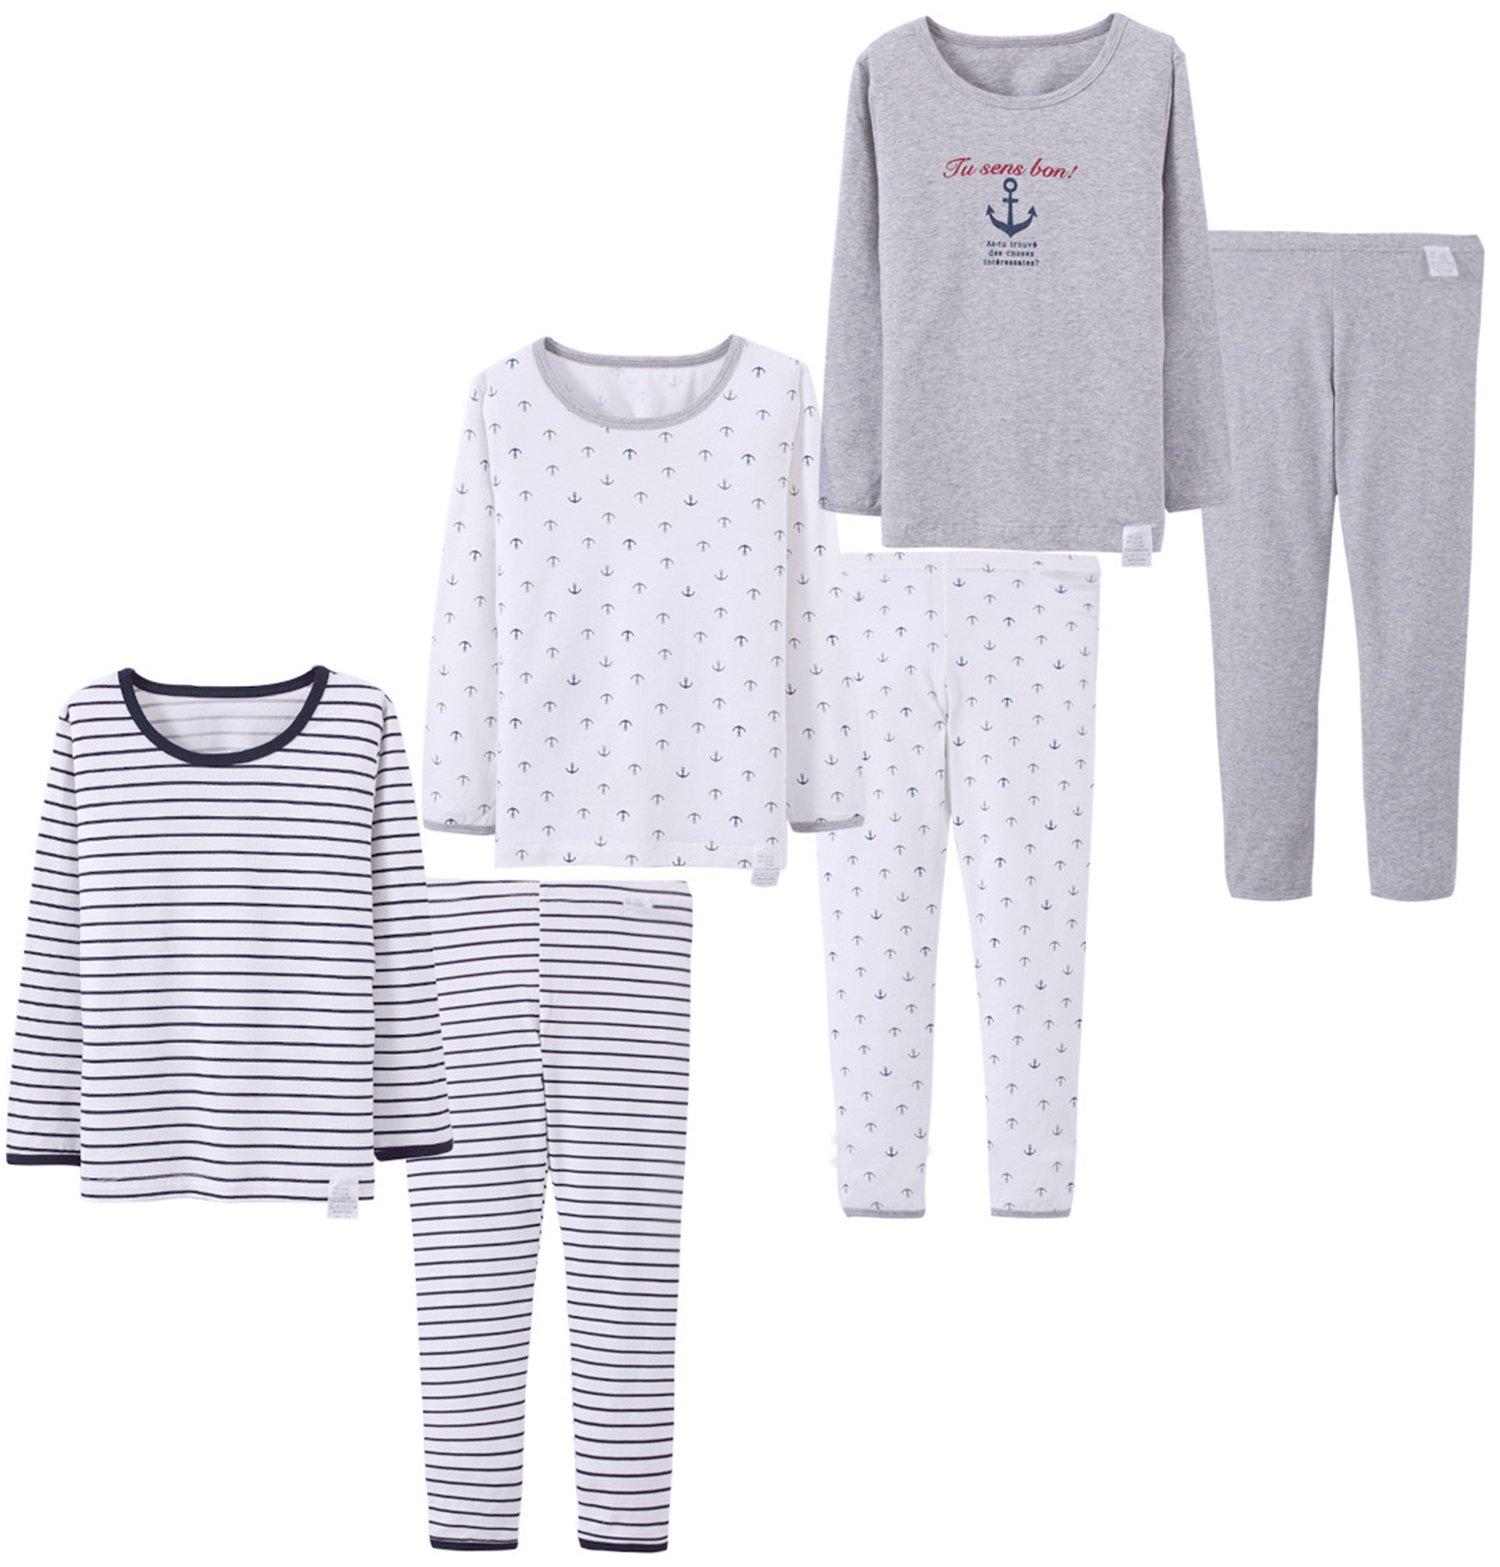 Abalacoco Big Girls Boys 3 Sets (6pcs) Cotton Longs sleeve Undershirts Autumn Winter Thermal Underwear Pants Suit 4-12T (Grey/White/Stripe, 8-9 Years)